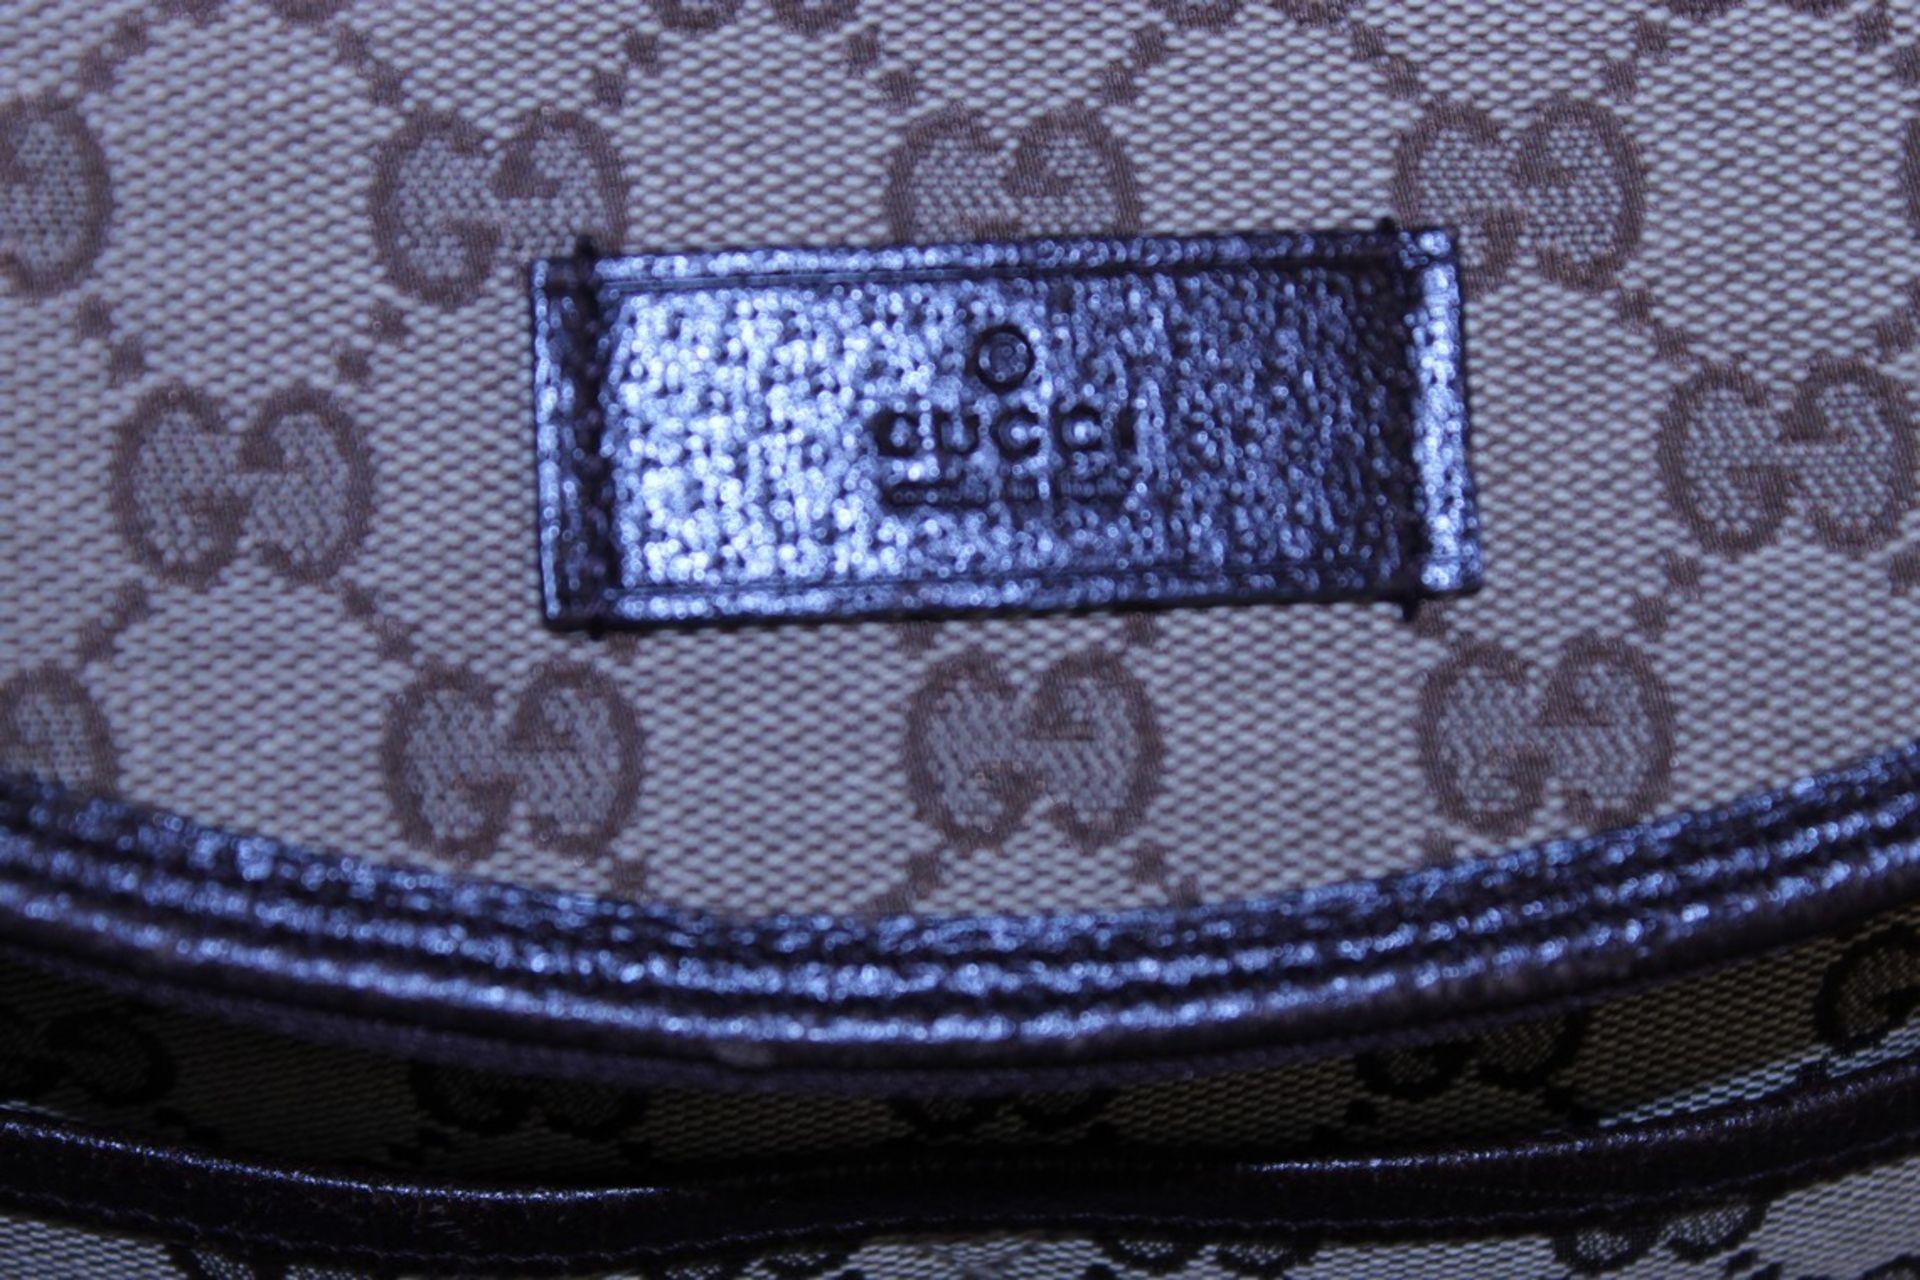 RRP £1,200 Gucci Original Diaper Bag, Beige/Dark Brown Monogramme Canvas, 36X28X12Cm (Production - Image 4 of 5